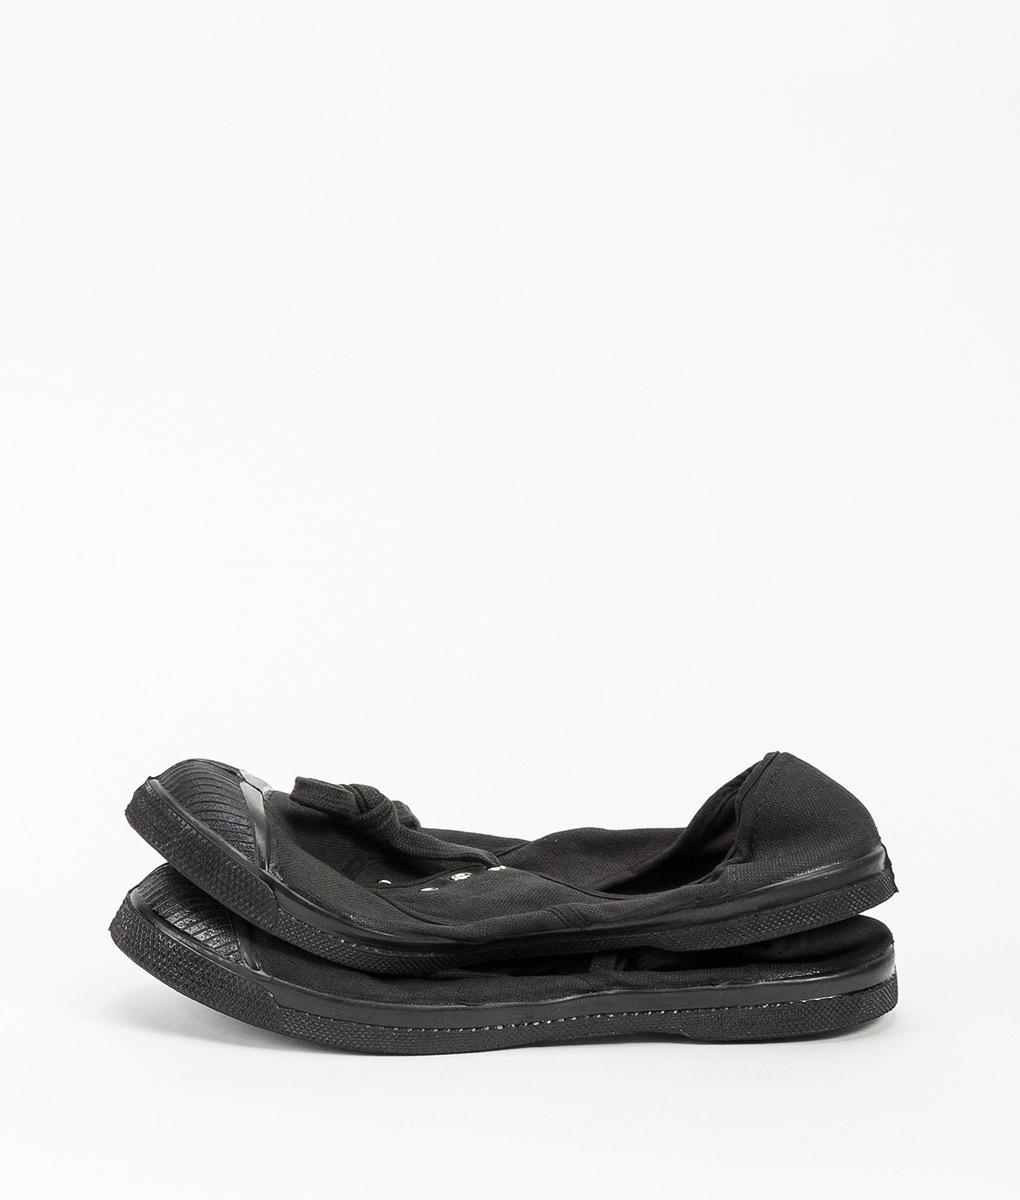 BENSIMON Women Sneakers 0835 COLORSOLE Carbone 44.99